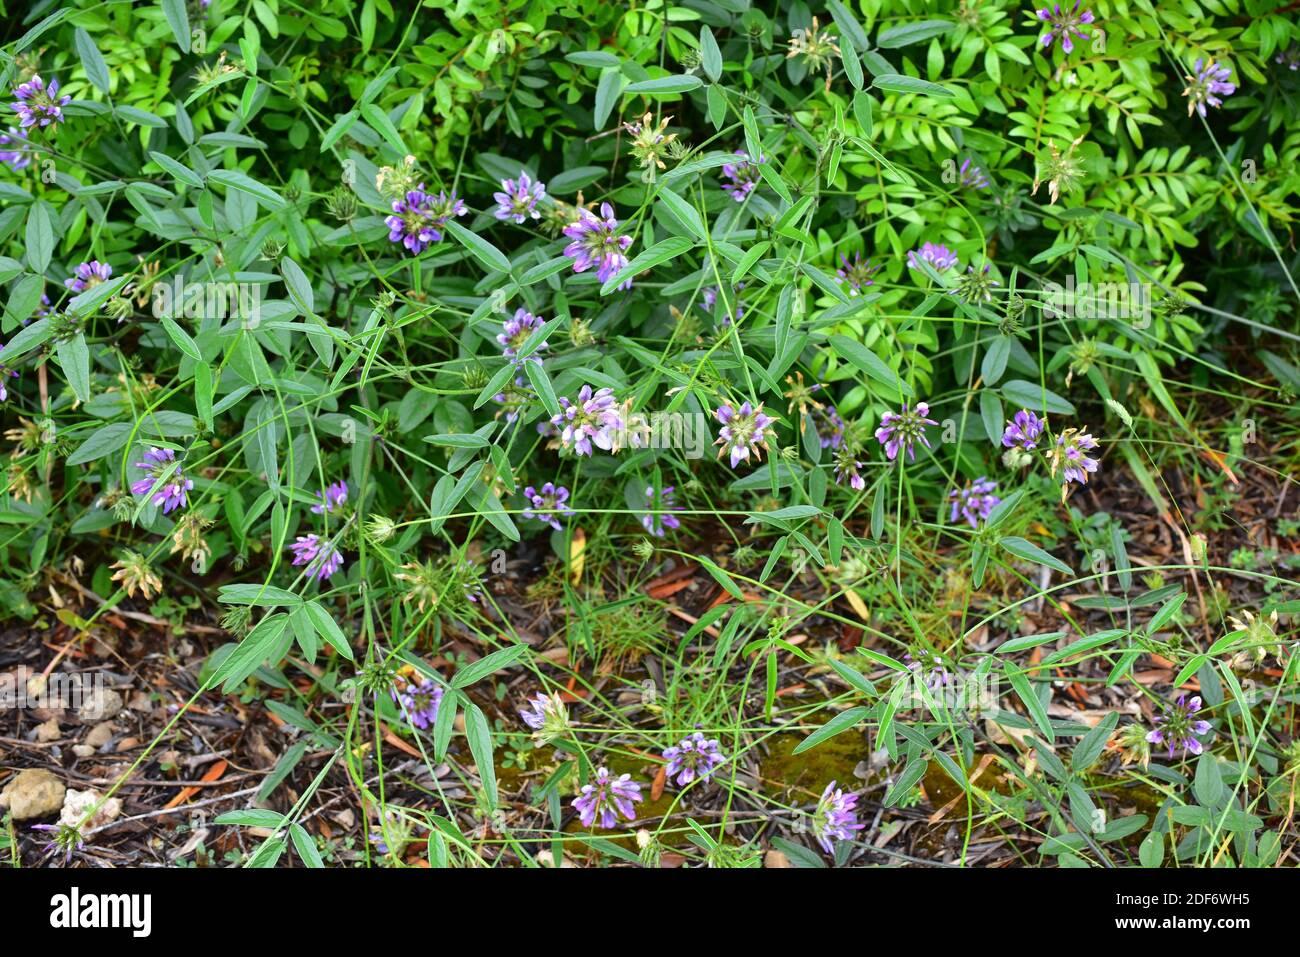 Arabian pea or pitch trefoil (Bituminaria bituminosa or Psoralea bituminosa) is a perennial herb native to Mediterranean Basin and western Asia. This Stock Photo